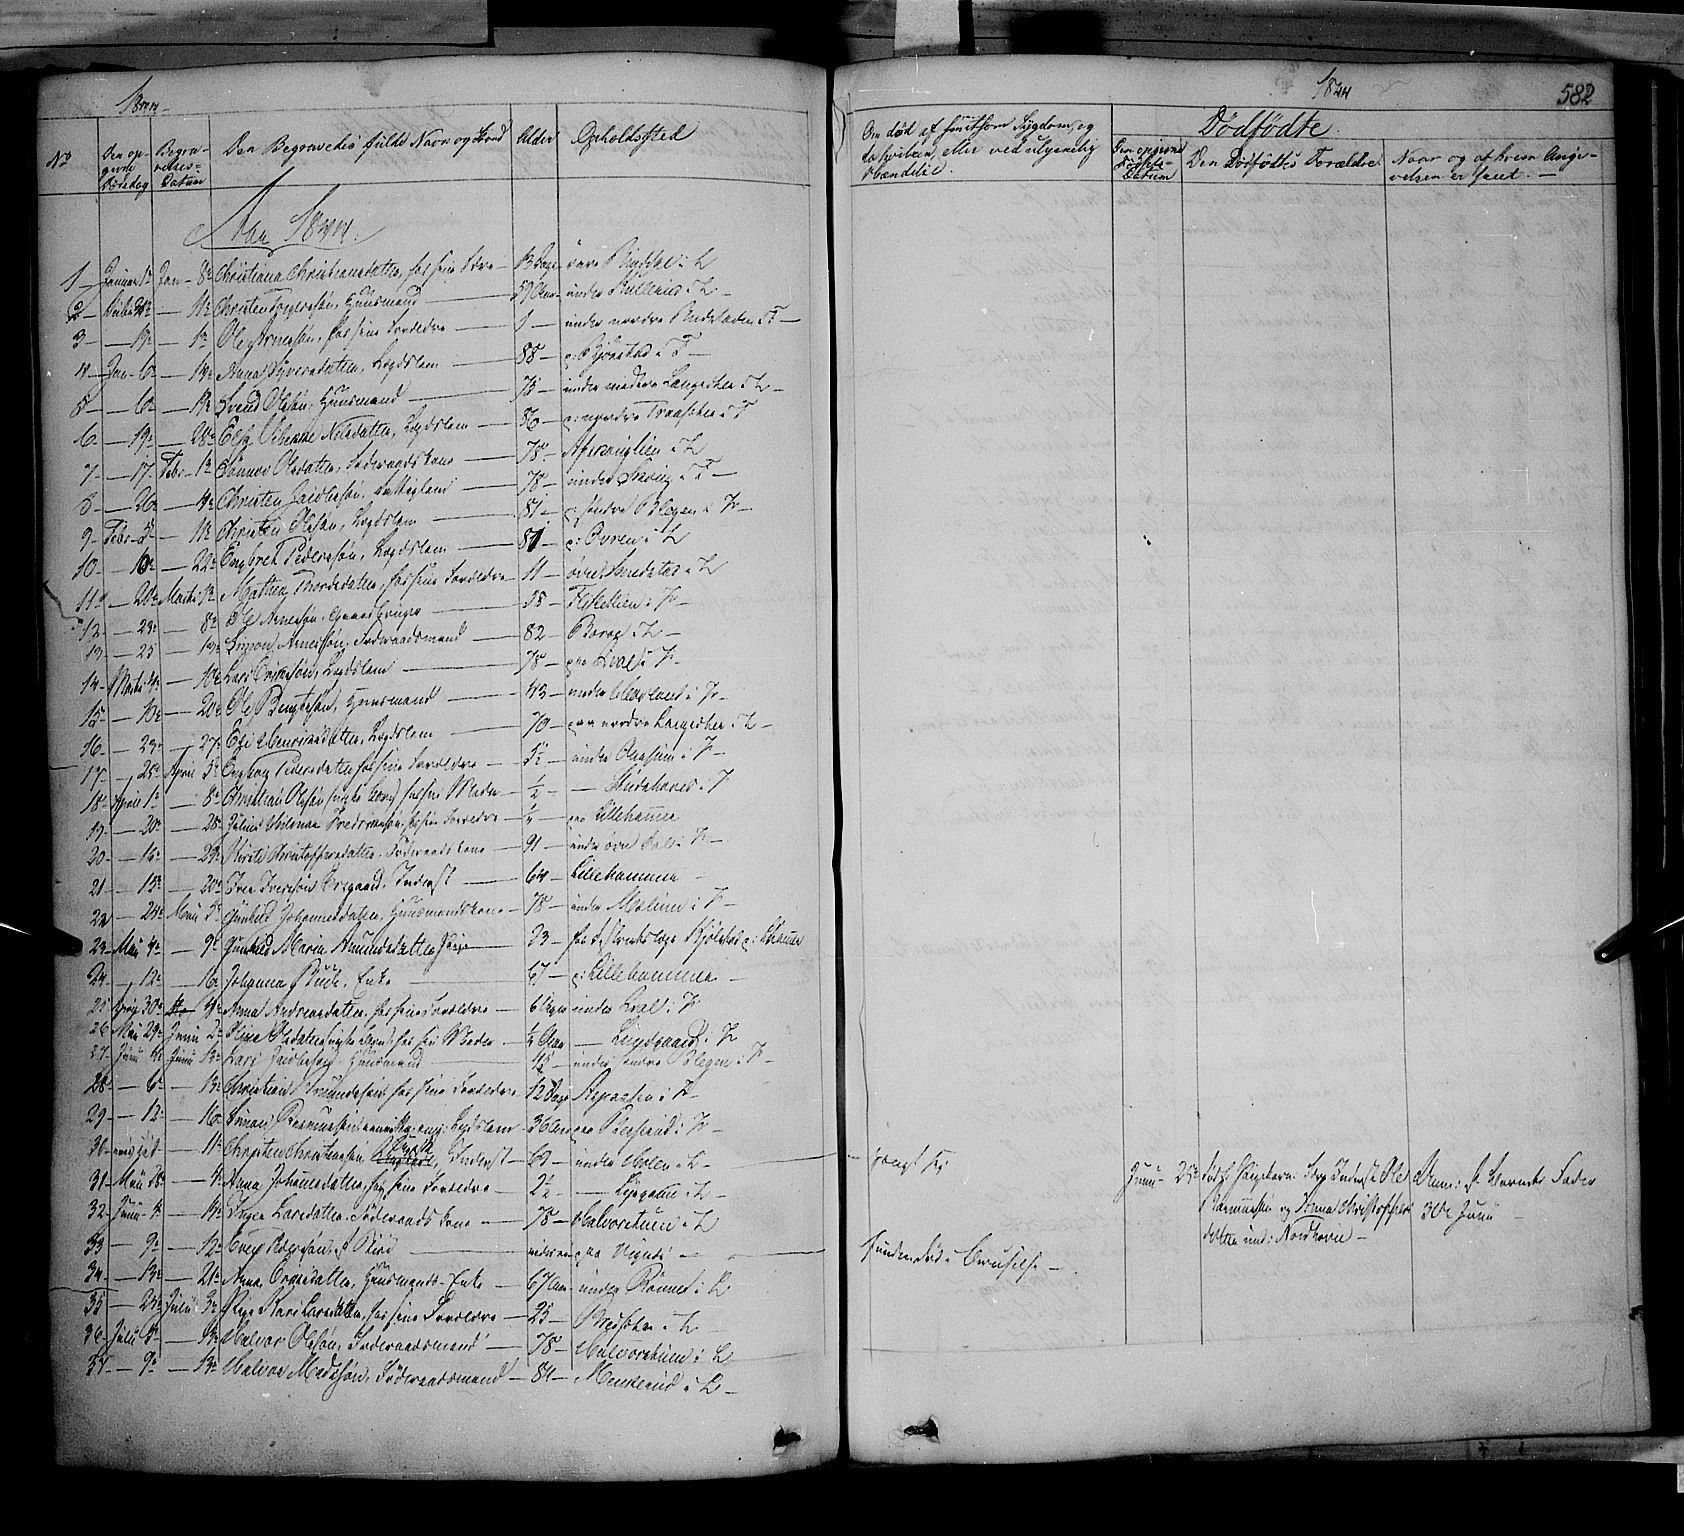 SAH, Fåberg prestekontor, Ministerialbok nr. 5, 1836-1854, s. 581-582